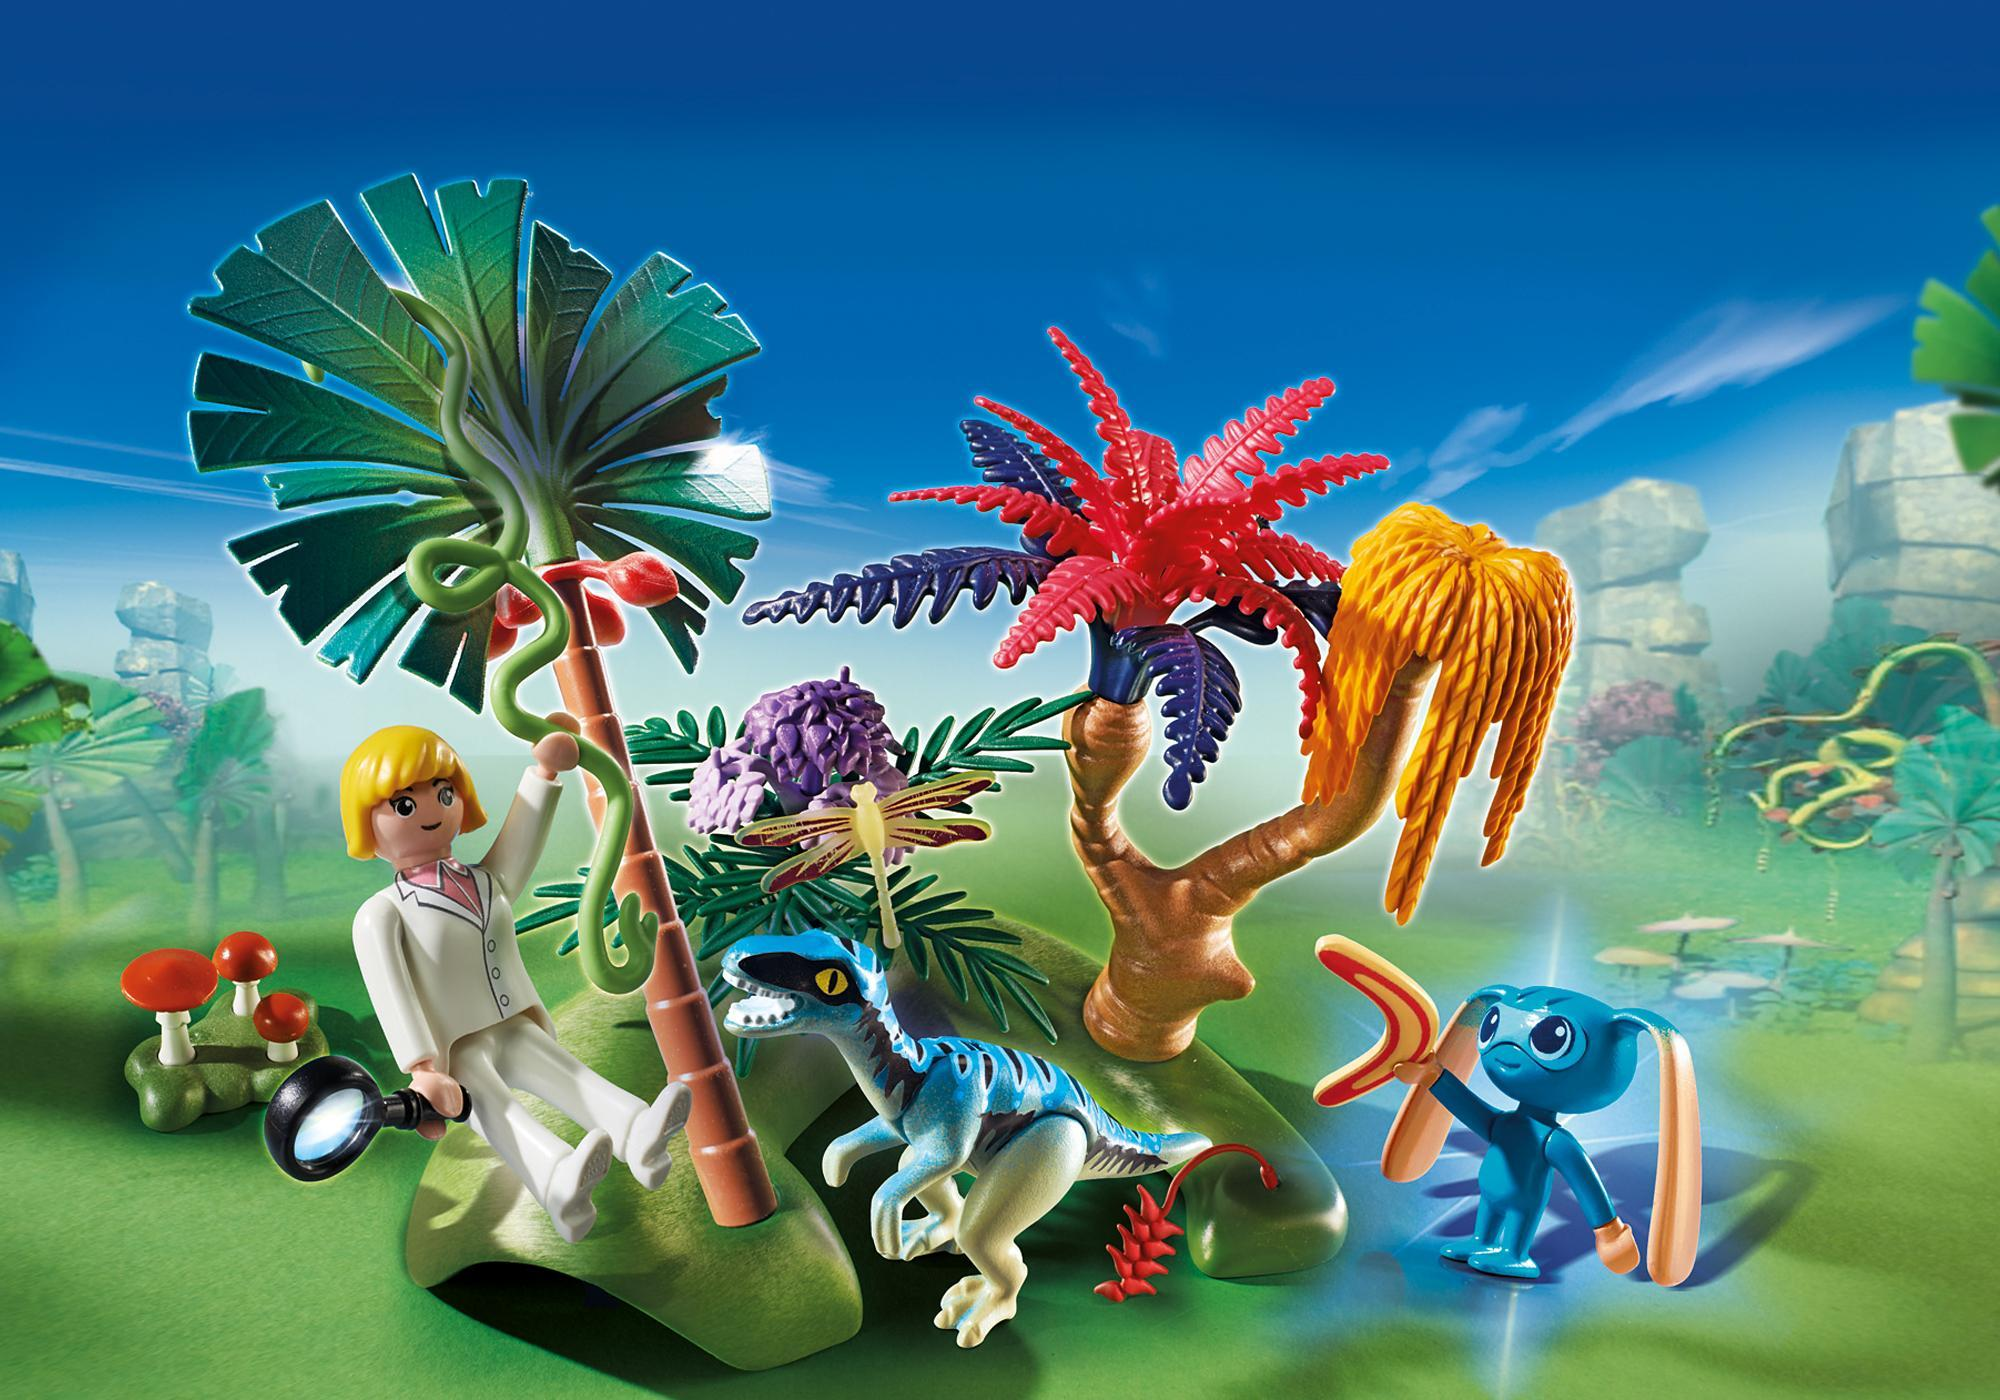 http://media.playmobil.com/i/playmobil/6687_product_detail/Затерянный остров с Алиен и Хищником